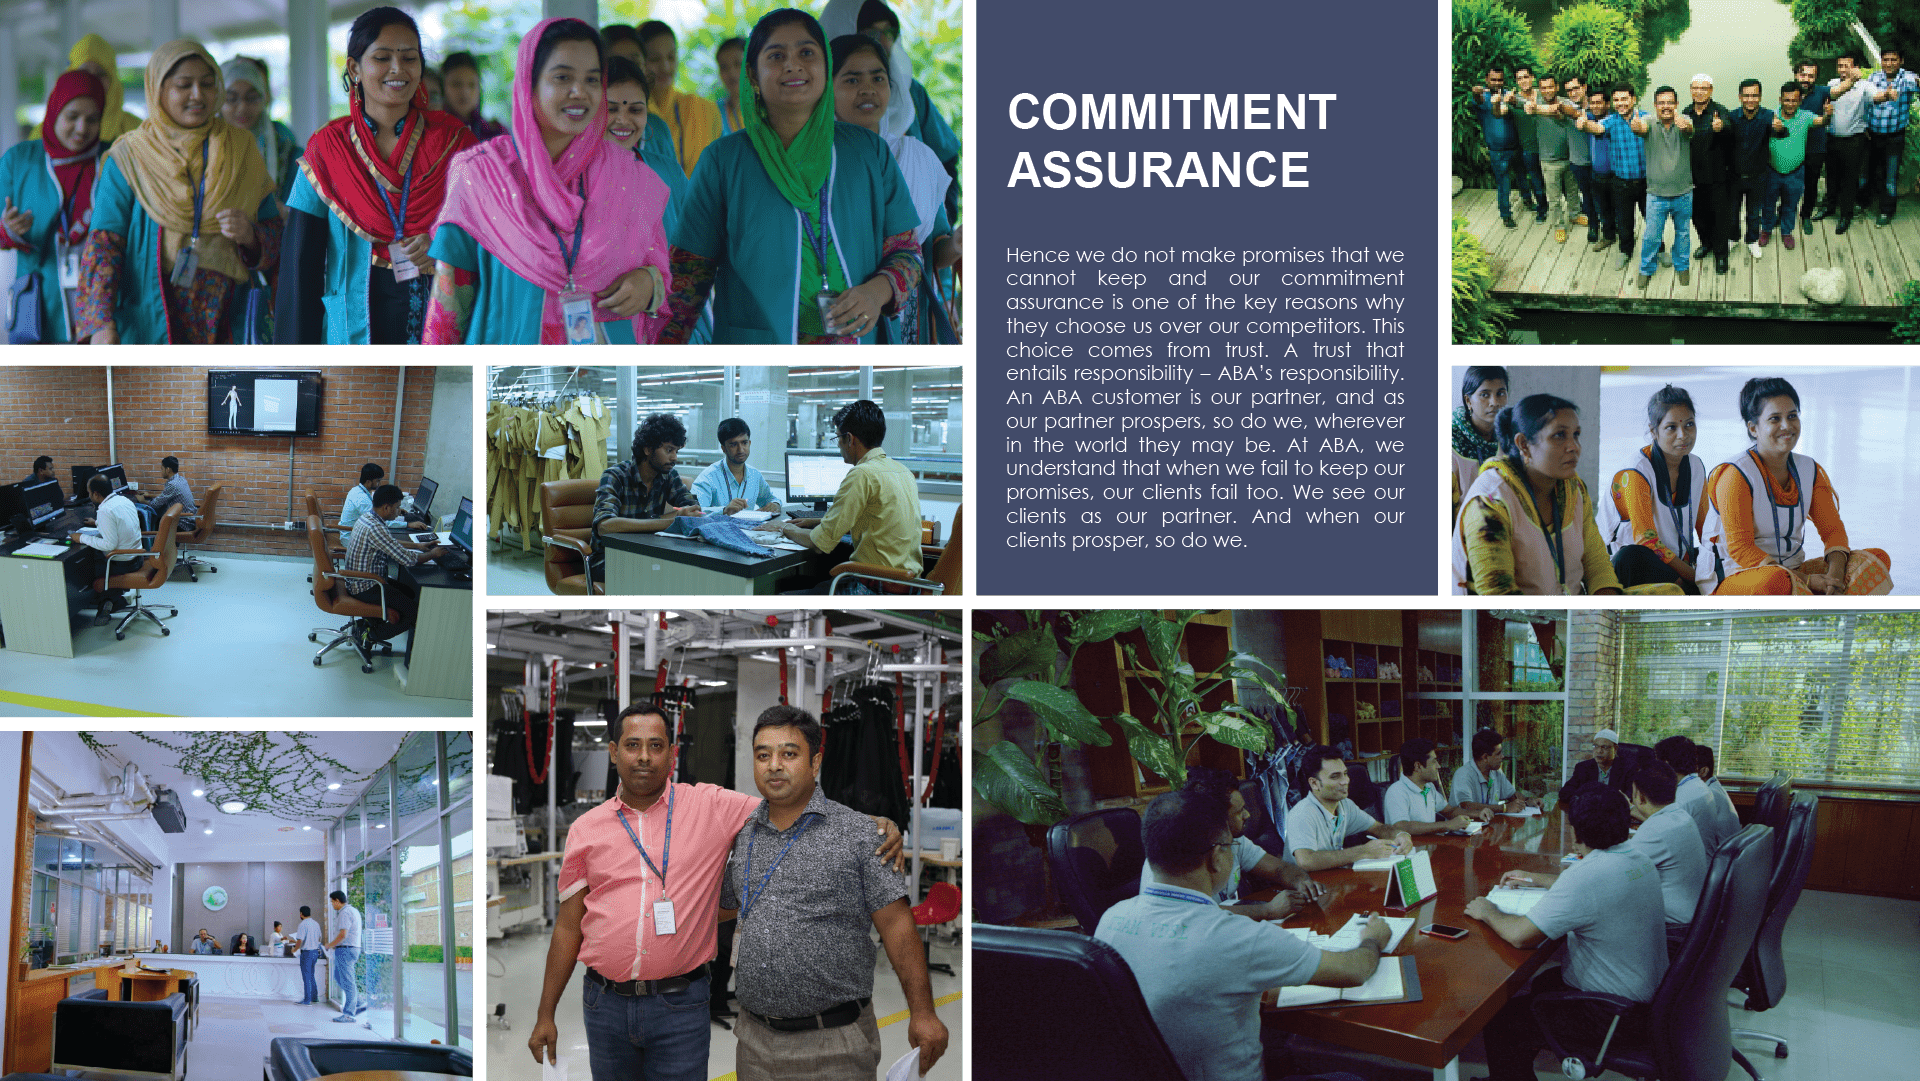 commitment_assurance